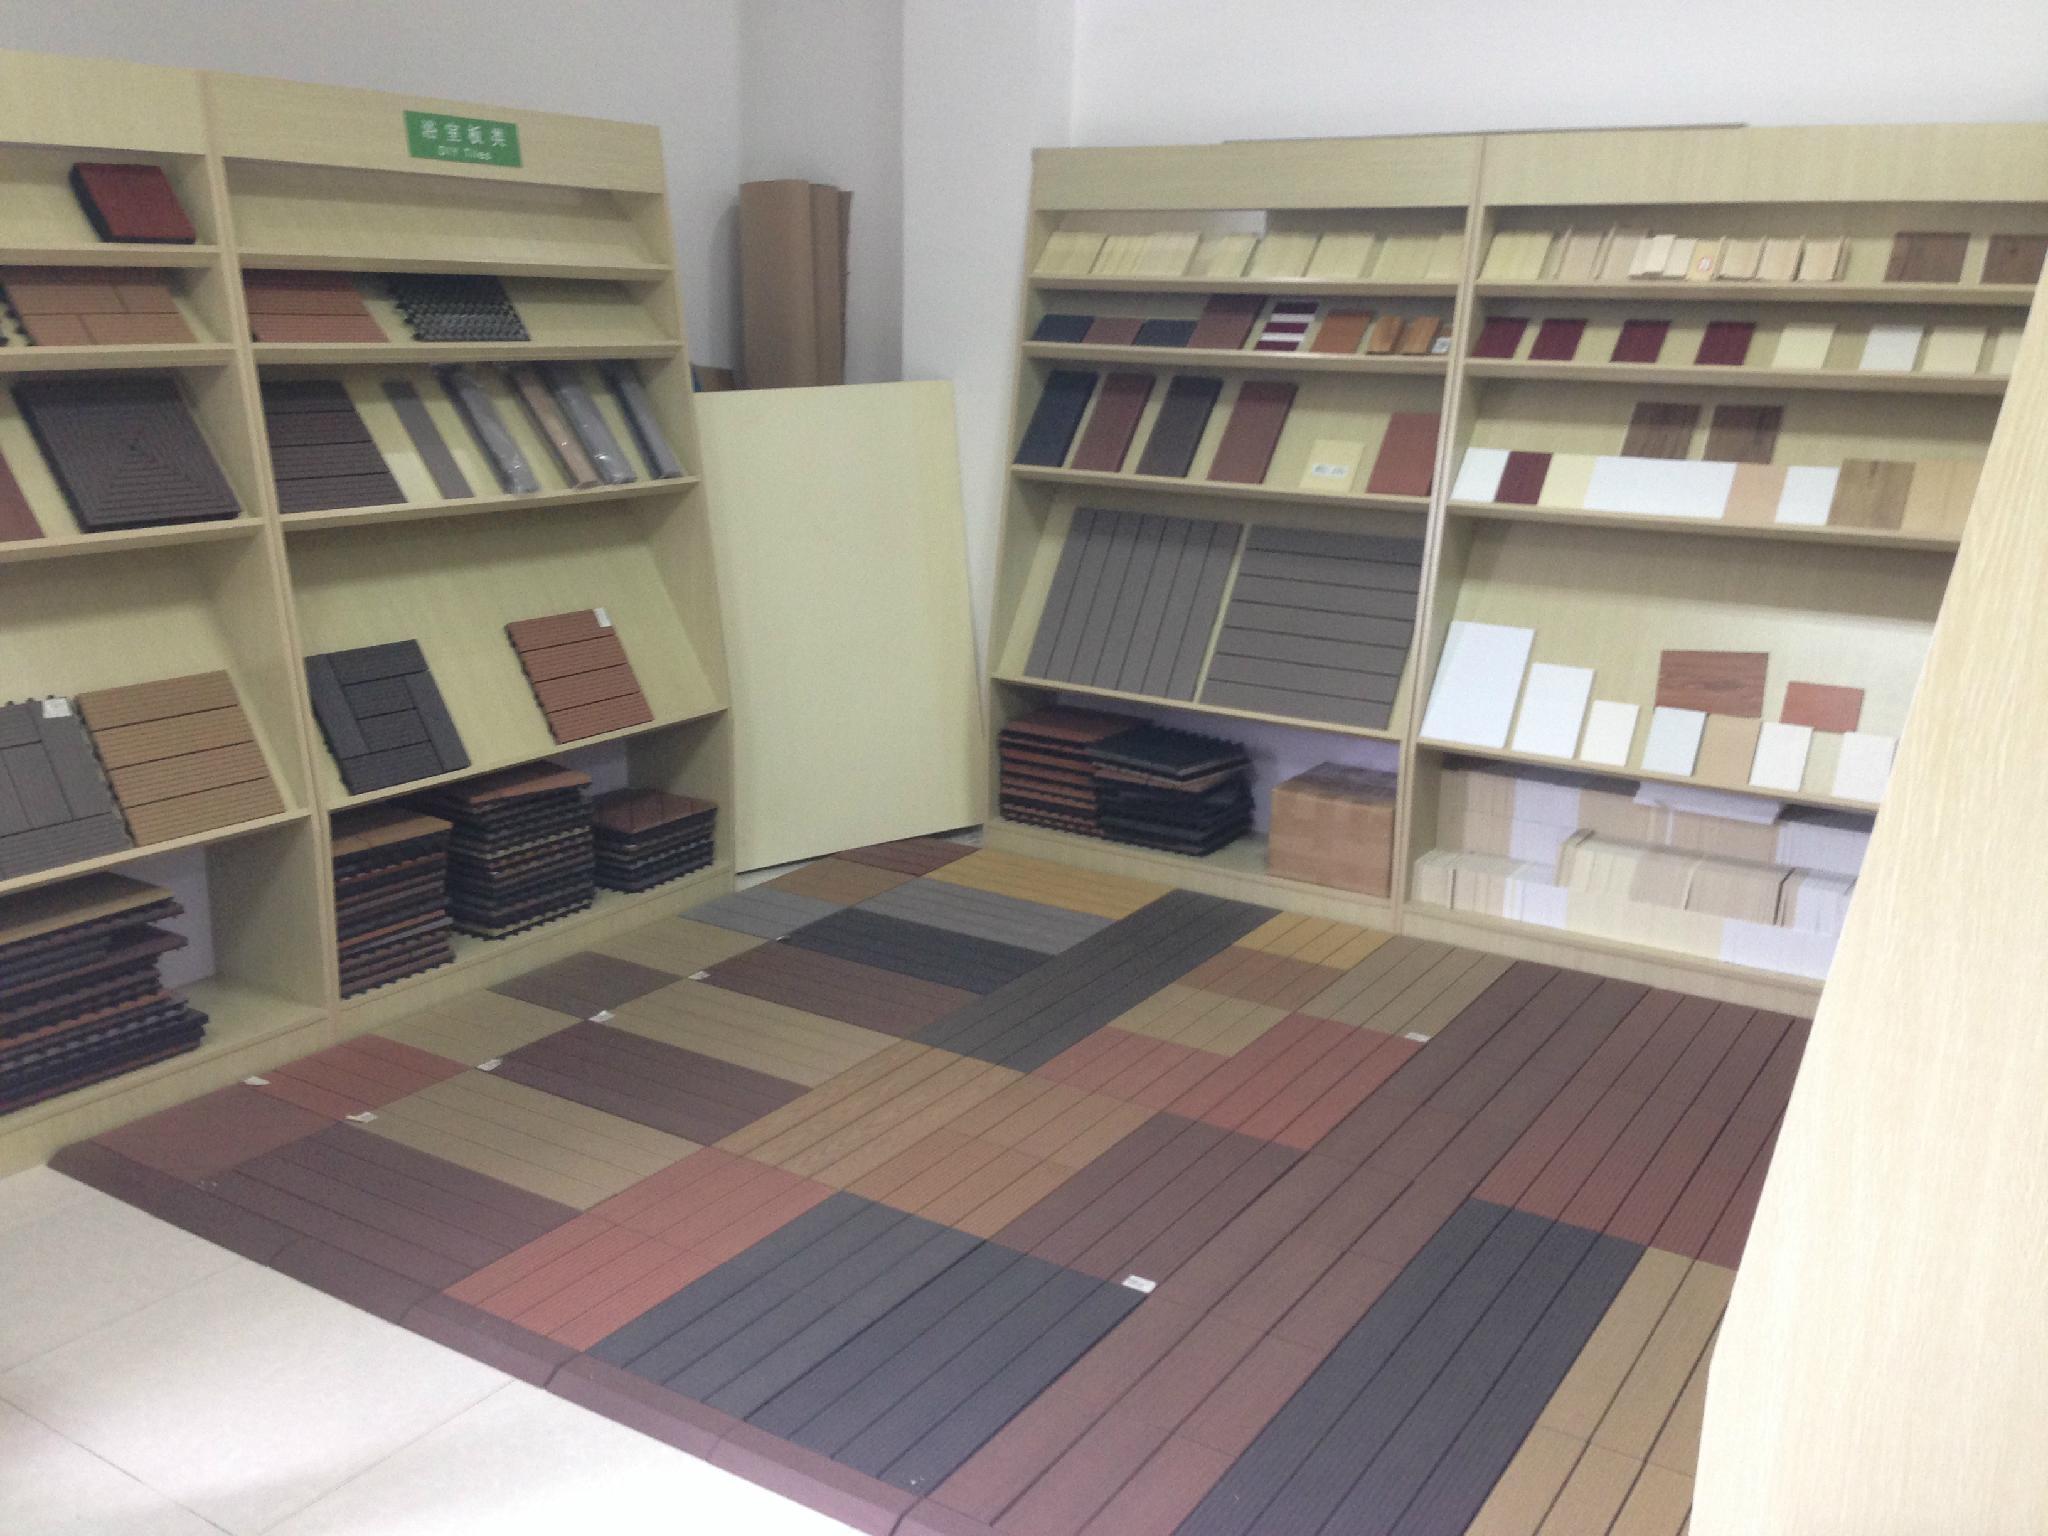 4040 wood plastic composite tile gazebo terraced decking wpc 4040 wood plastic composite tile gazebo terraced decking wpc tiles 4 dailygadgetfo Choice Image